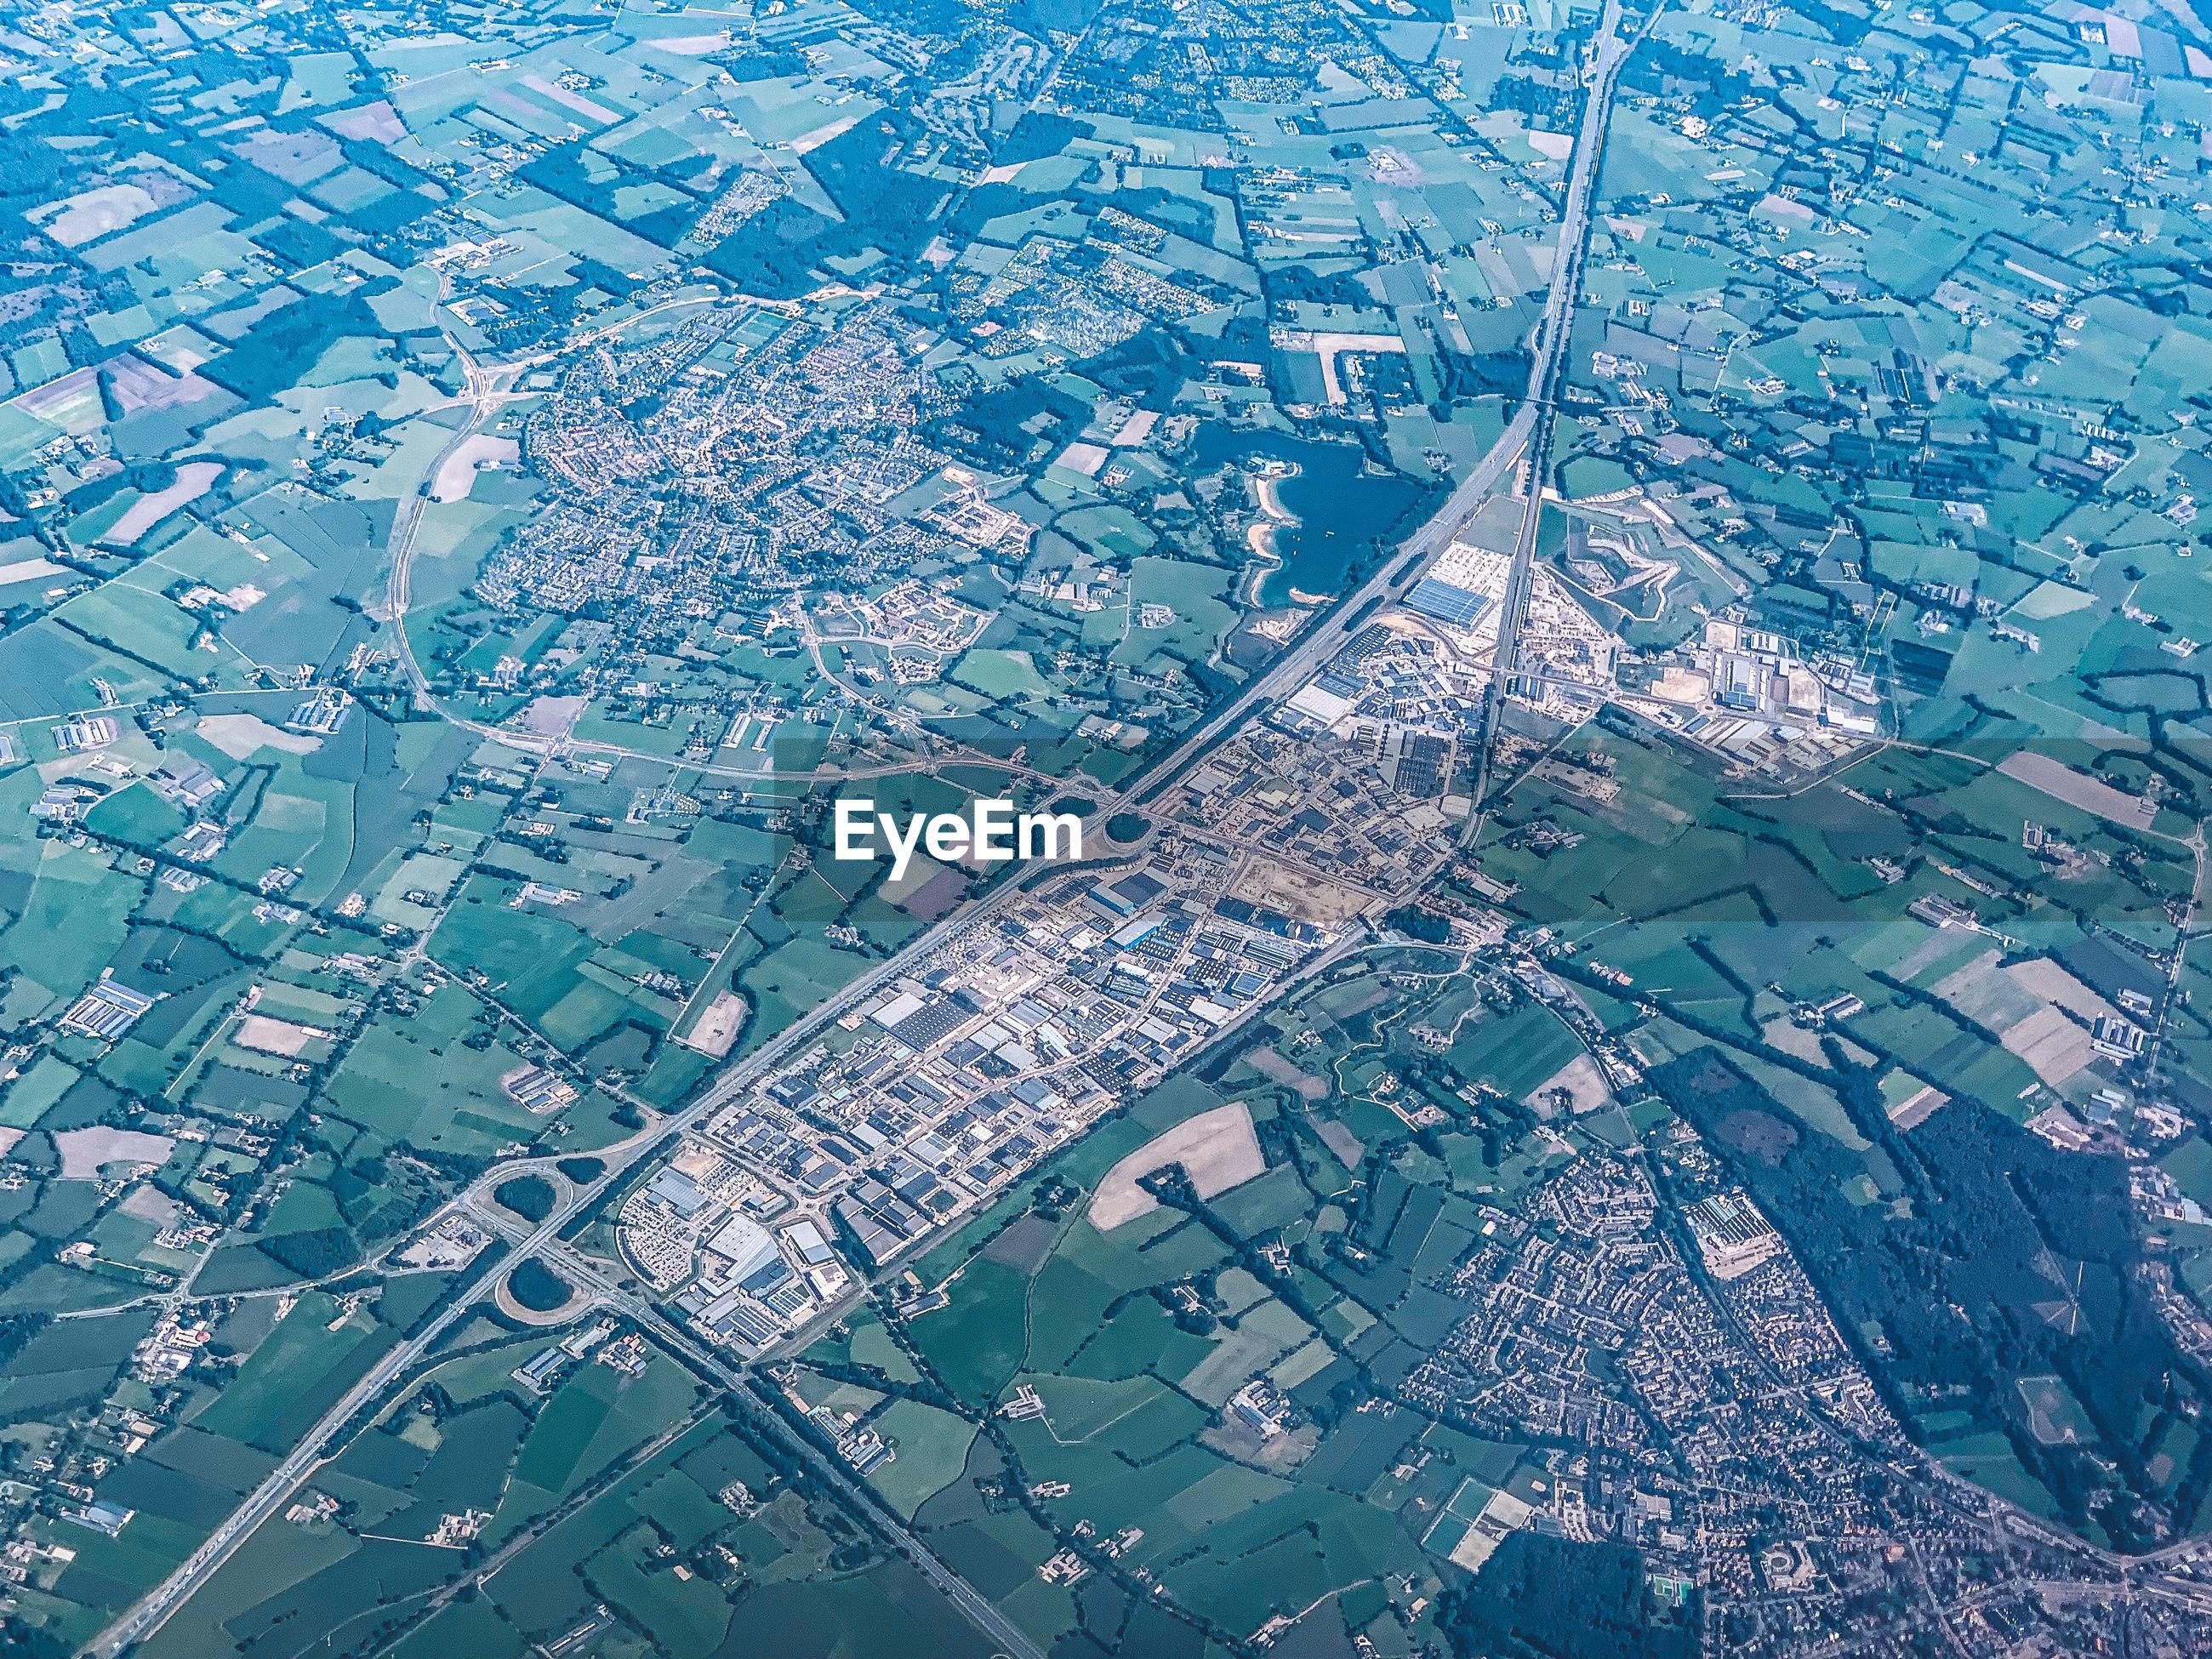 AERIAL VIEW OF CITY DURING RAINY SEASON